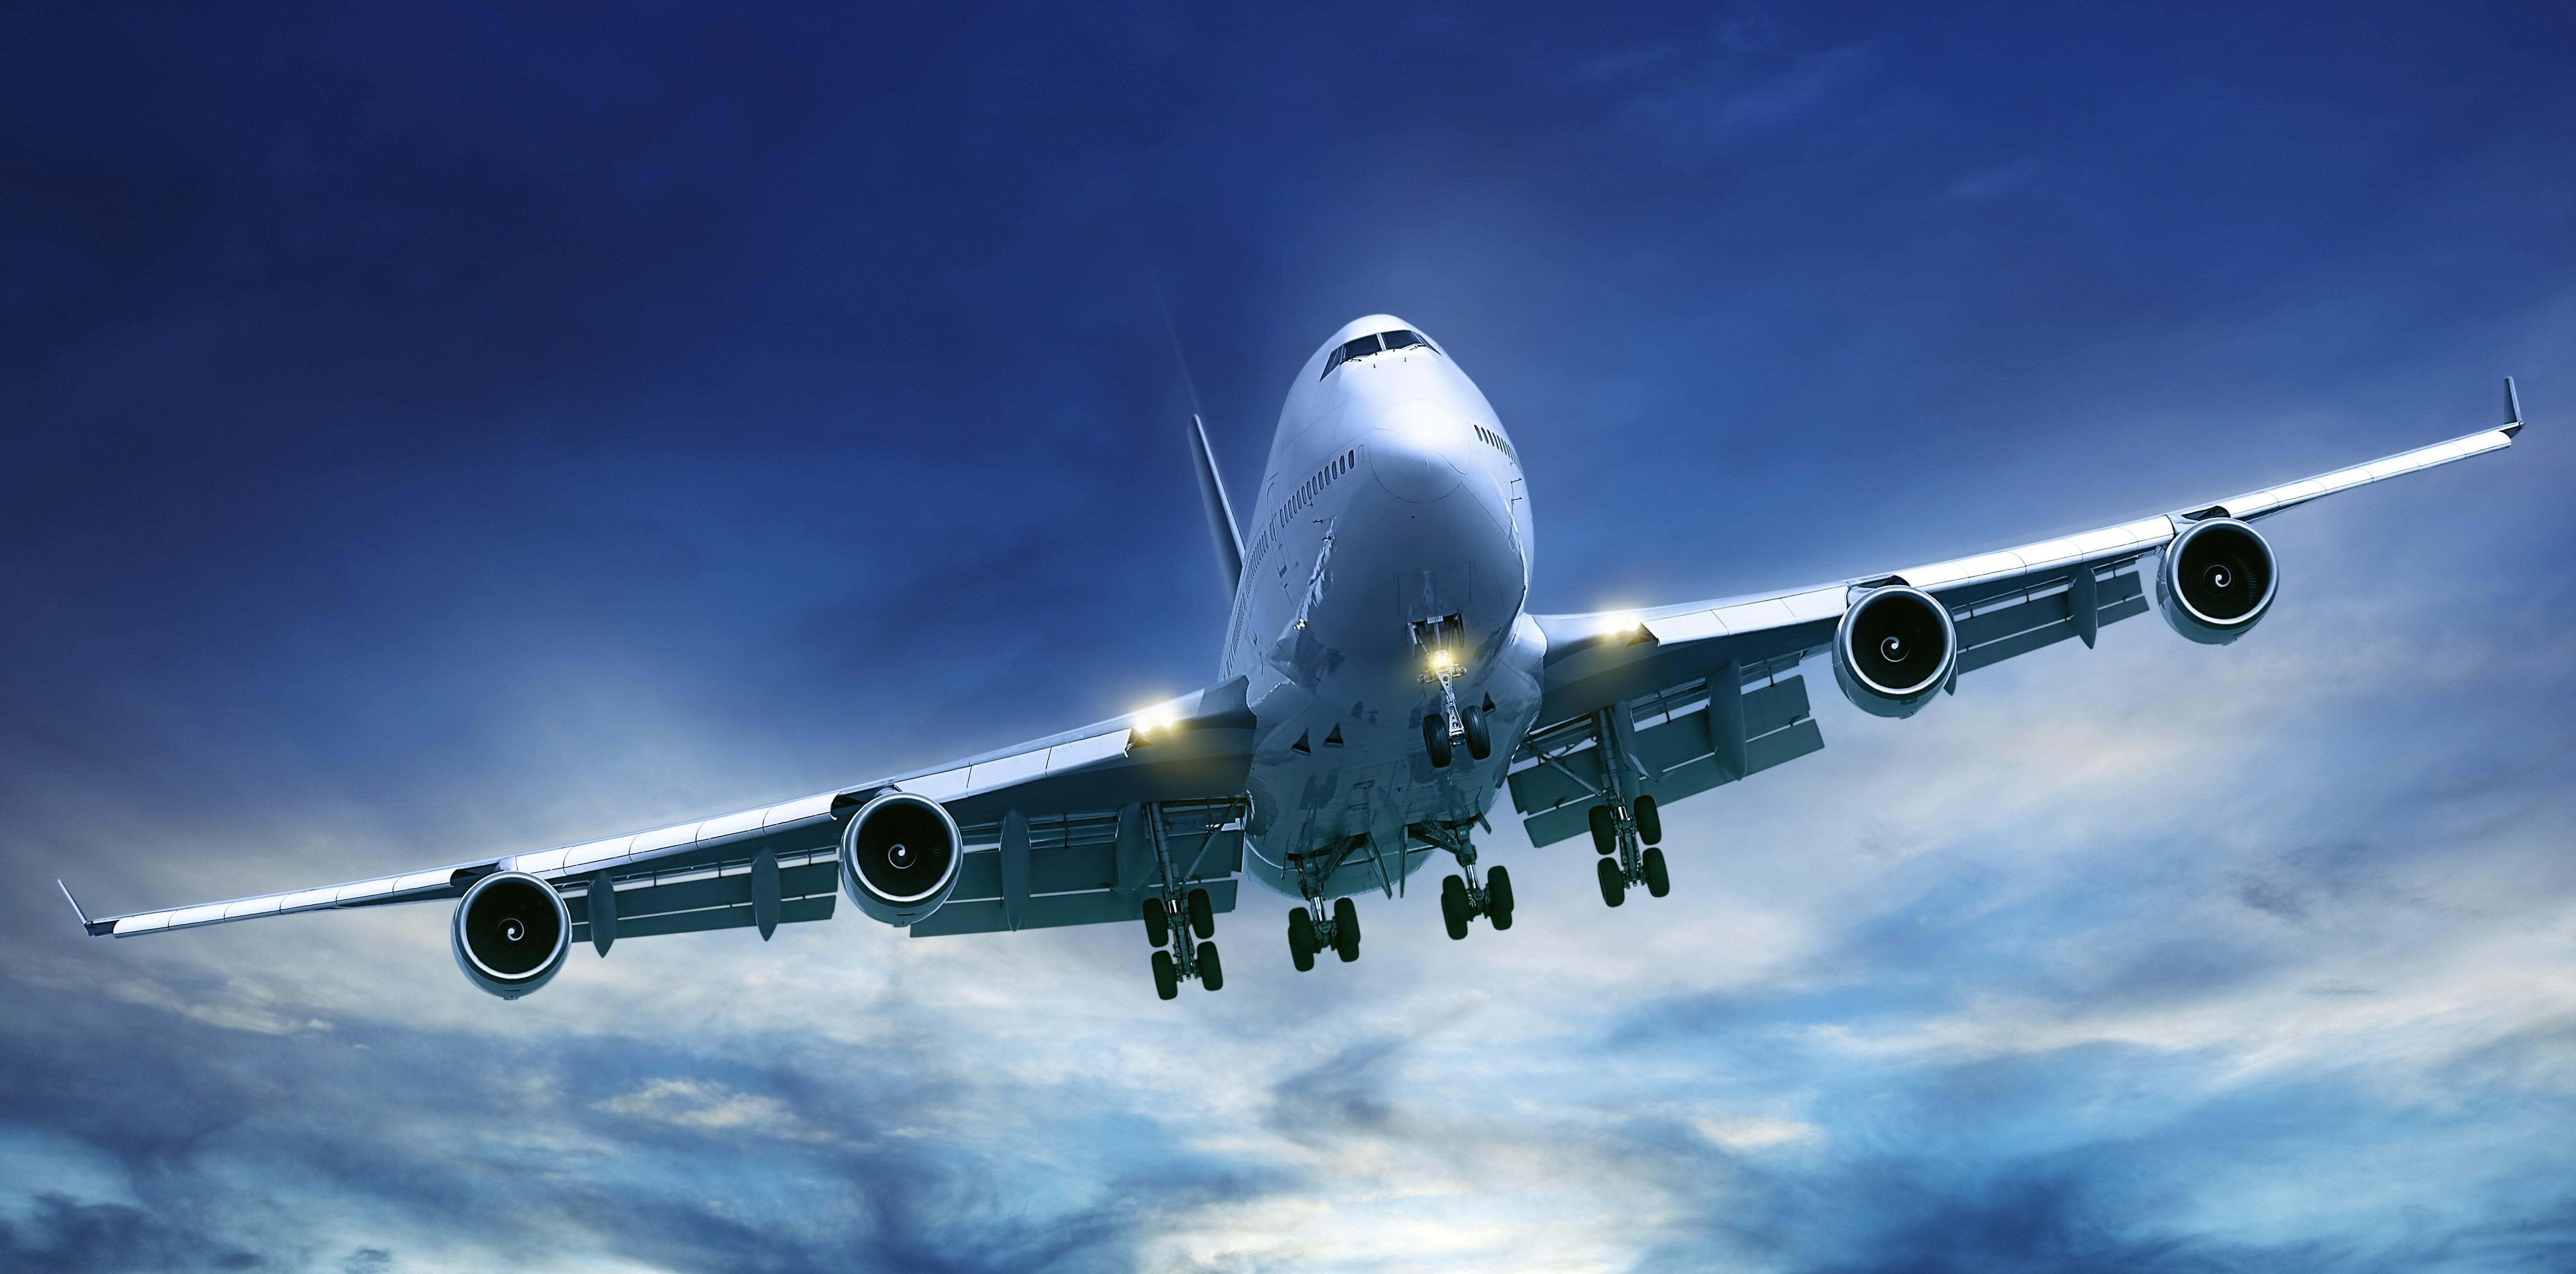 Comprar Passagens Aéreas